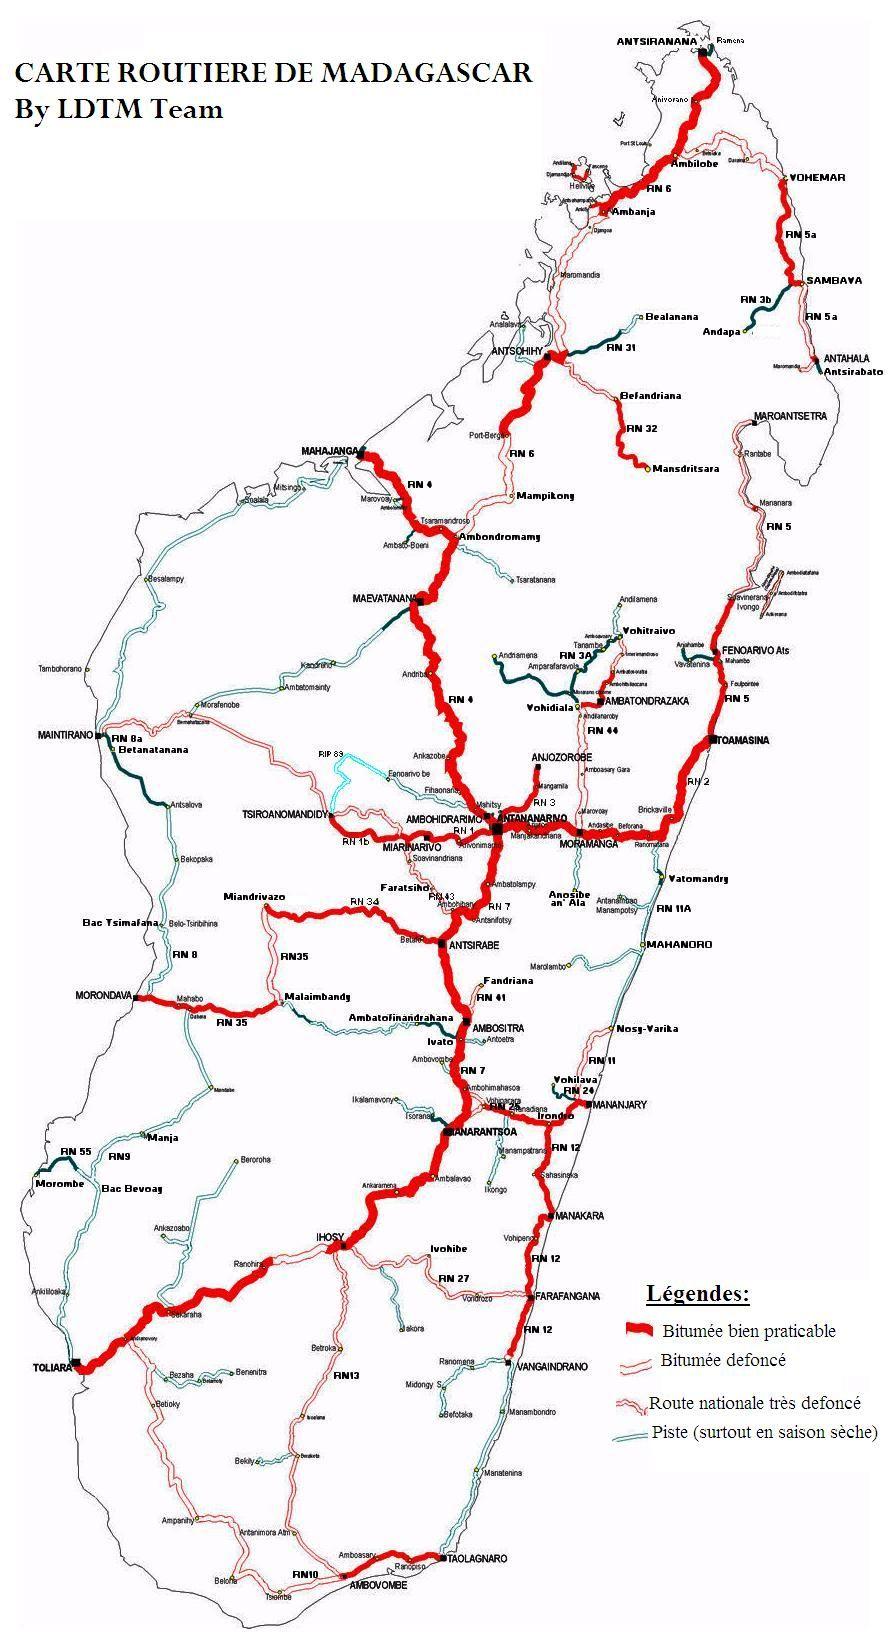 Carte Routiere Madagascar Gratuite.Ceci Est Une Carte Routiere De Madagascar Elle Vous